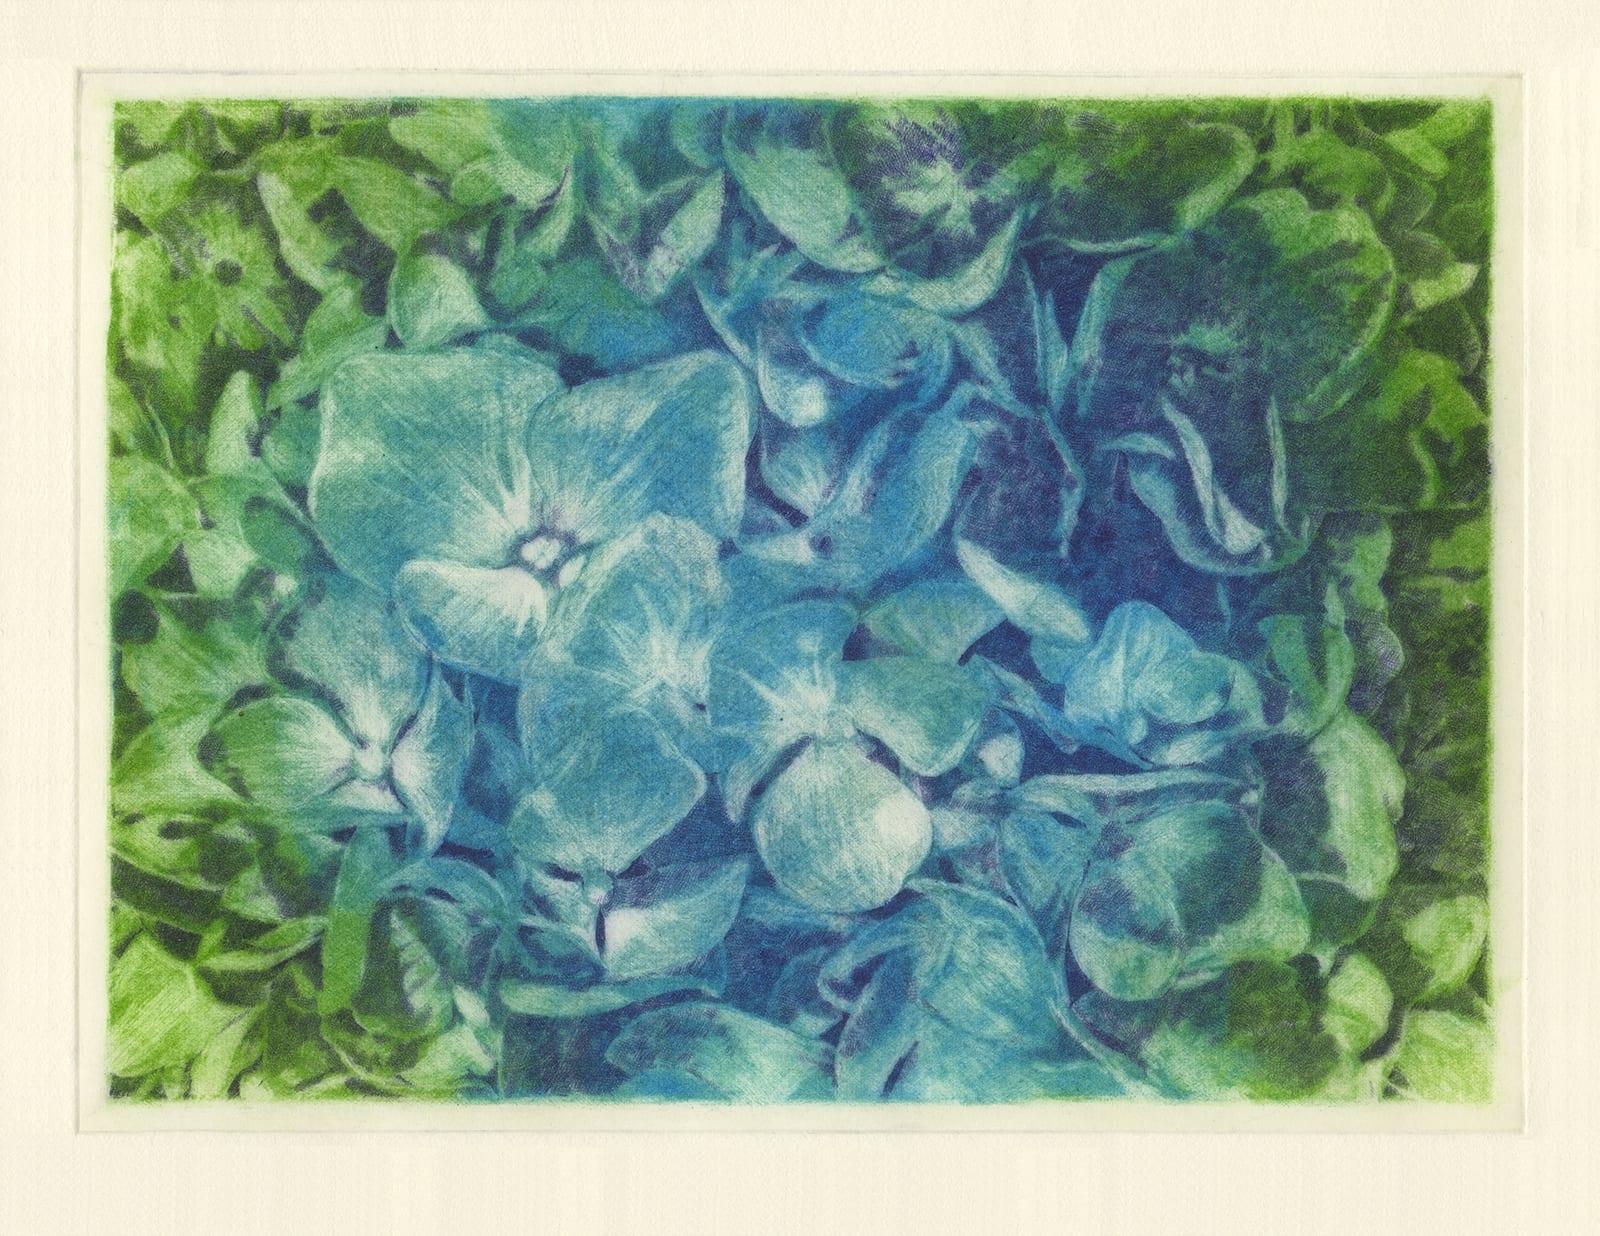 Thinking flowers: Hydrangea (drypoint etching by Yaemi Shigyo)